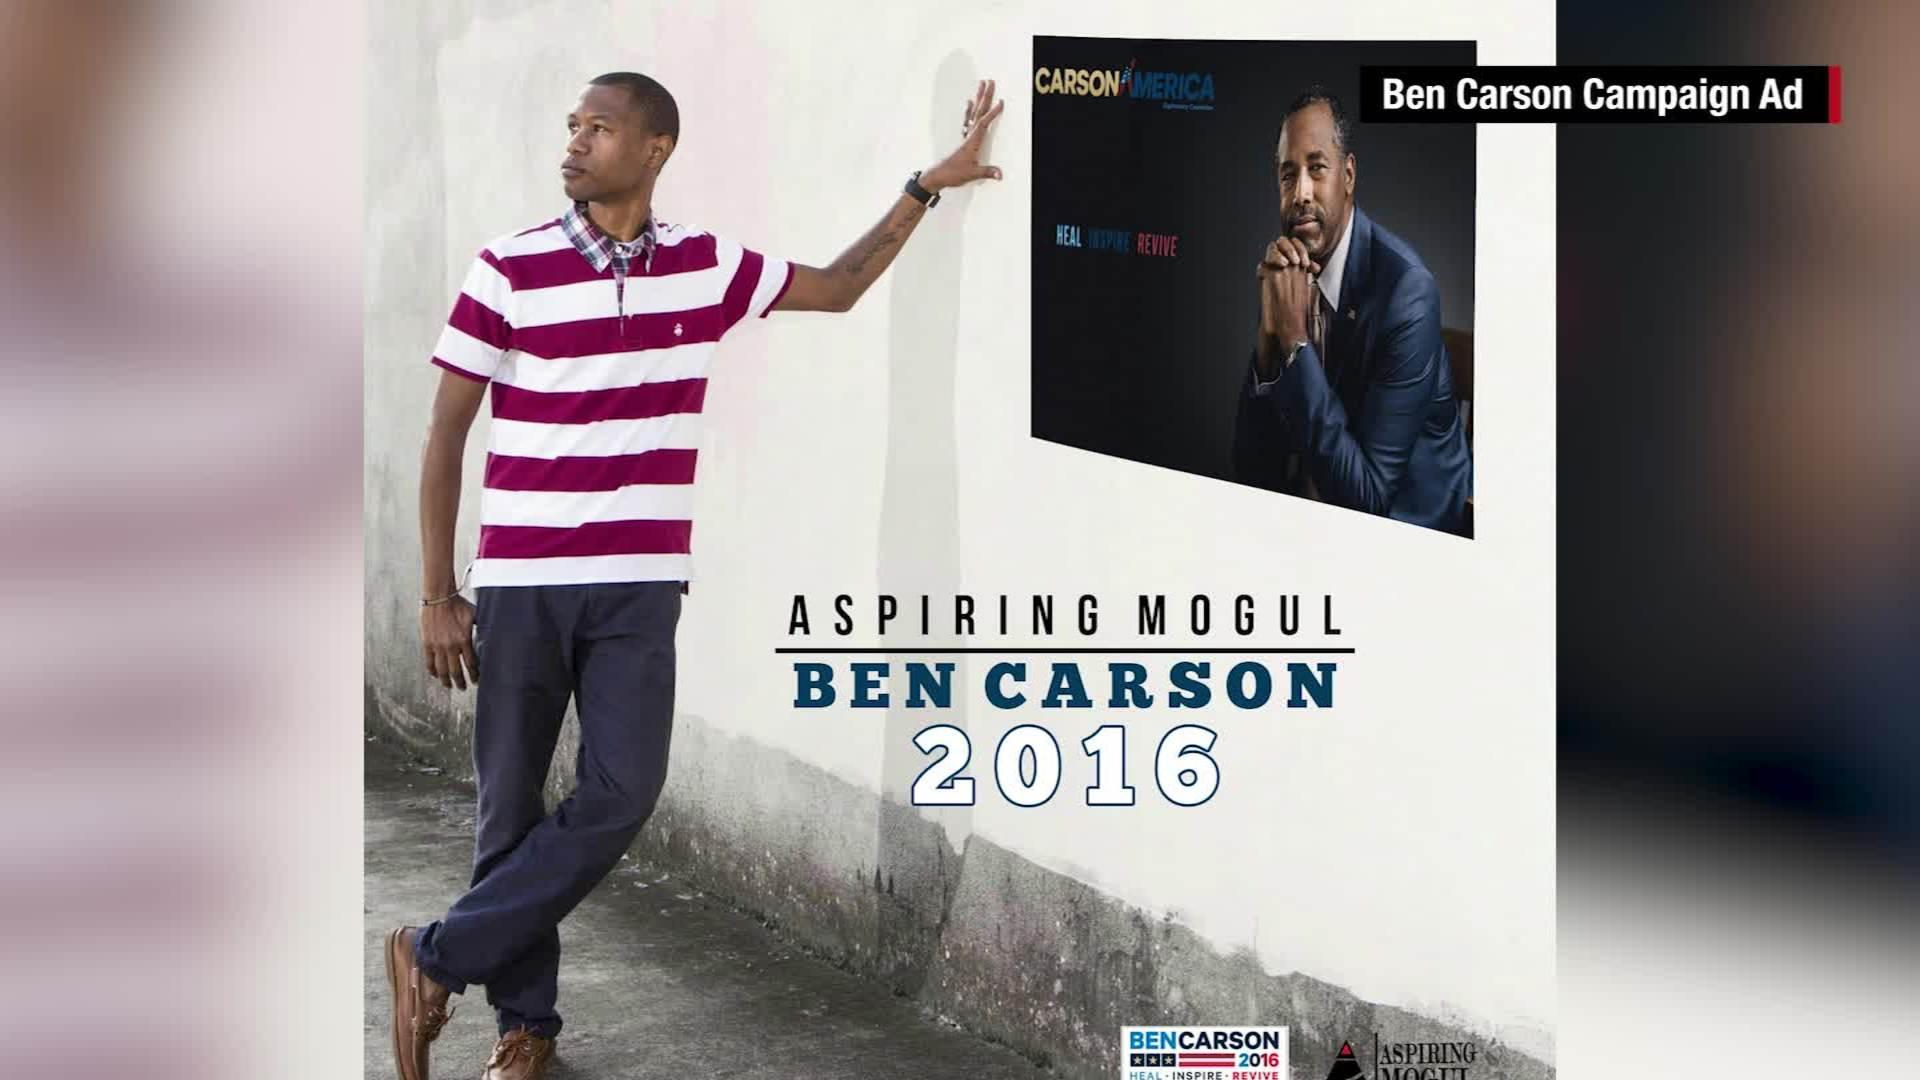 Ben Carsons new radio ad CNN Video